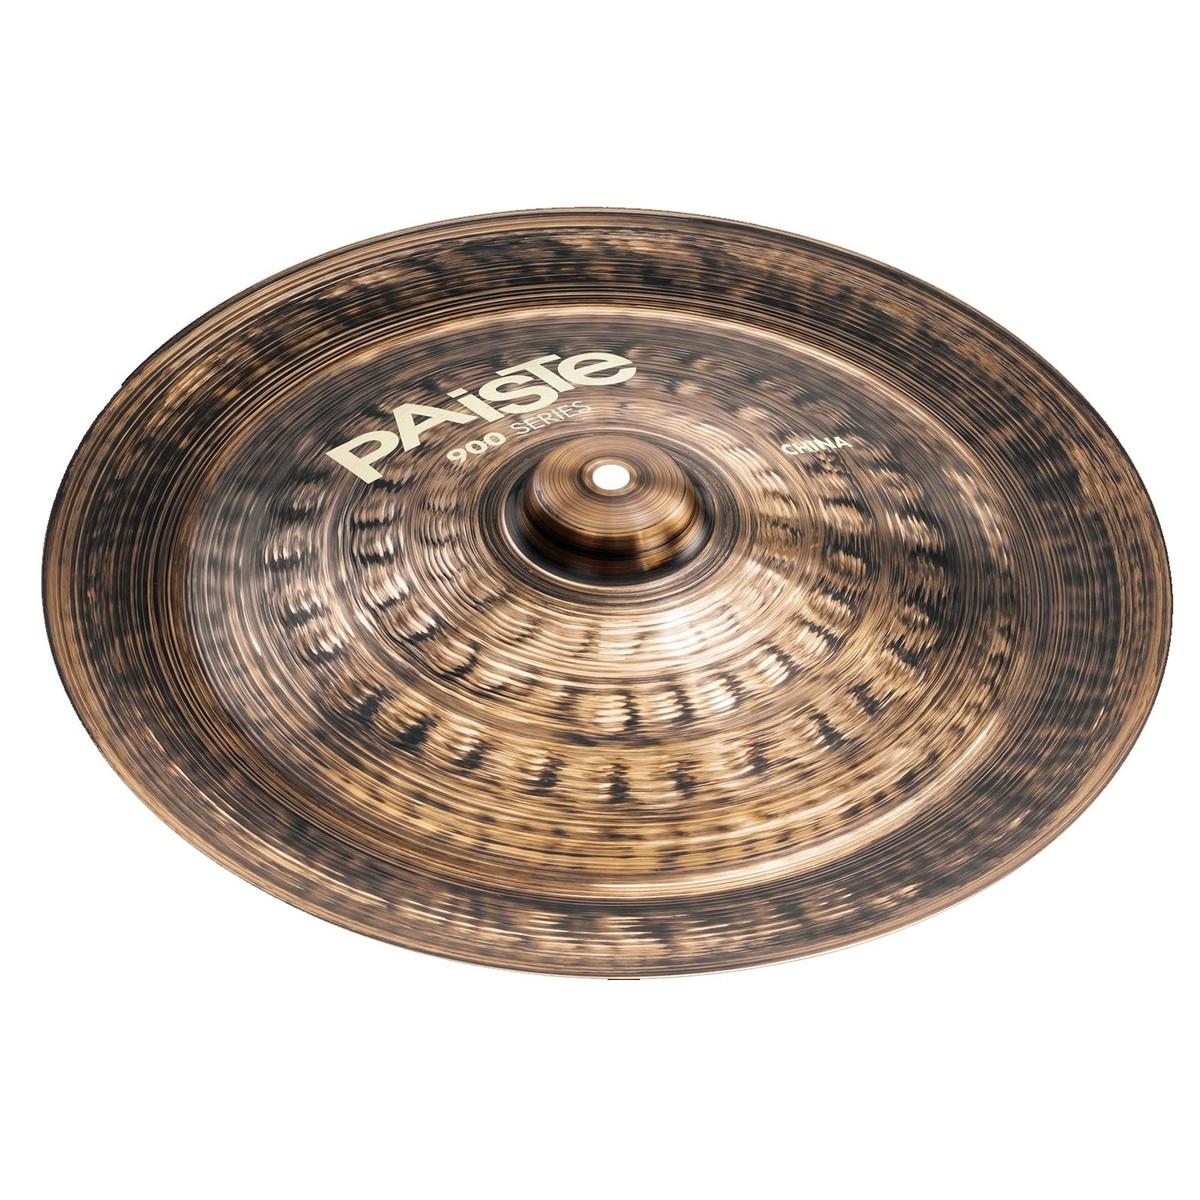 Paiste cymbal dating